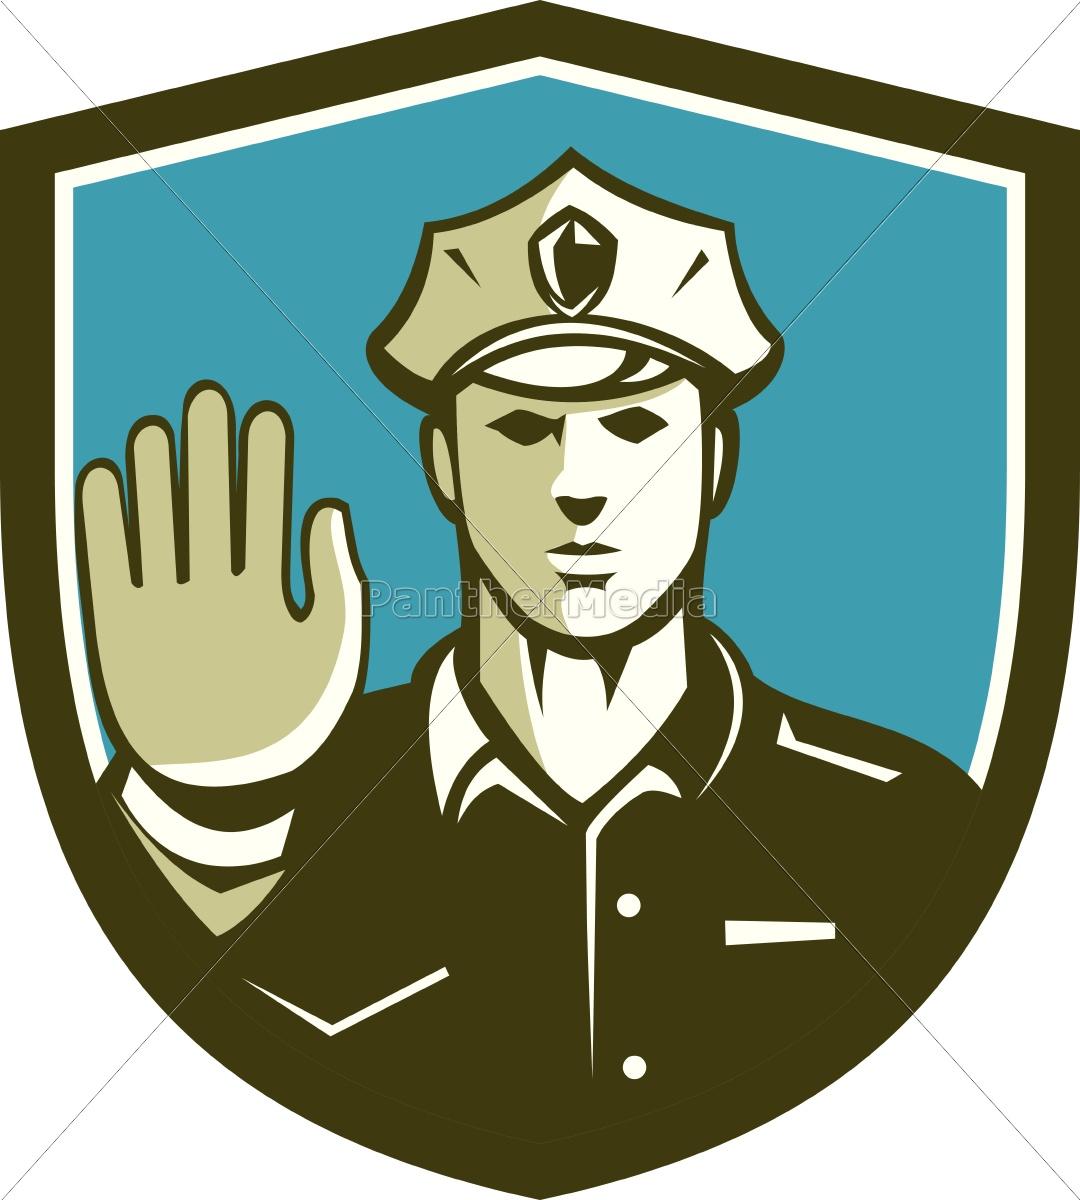 verkehrspolizist, hand, stoppschild, schild, retro - 14505635